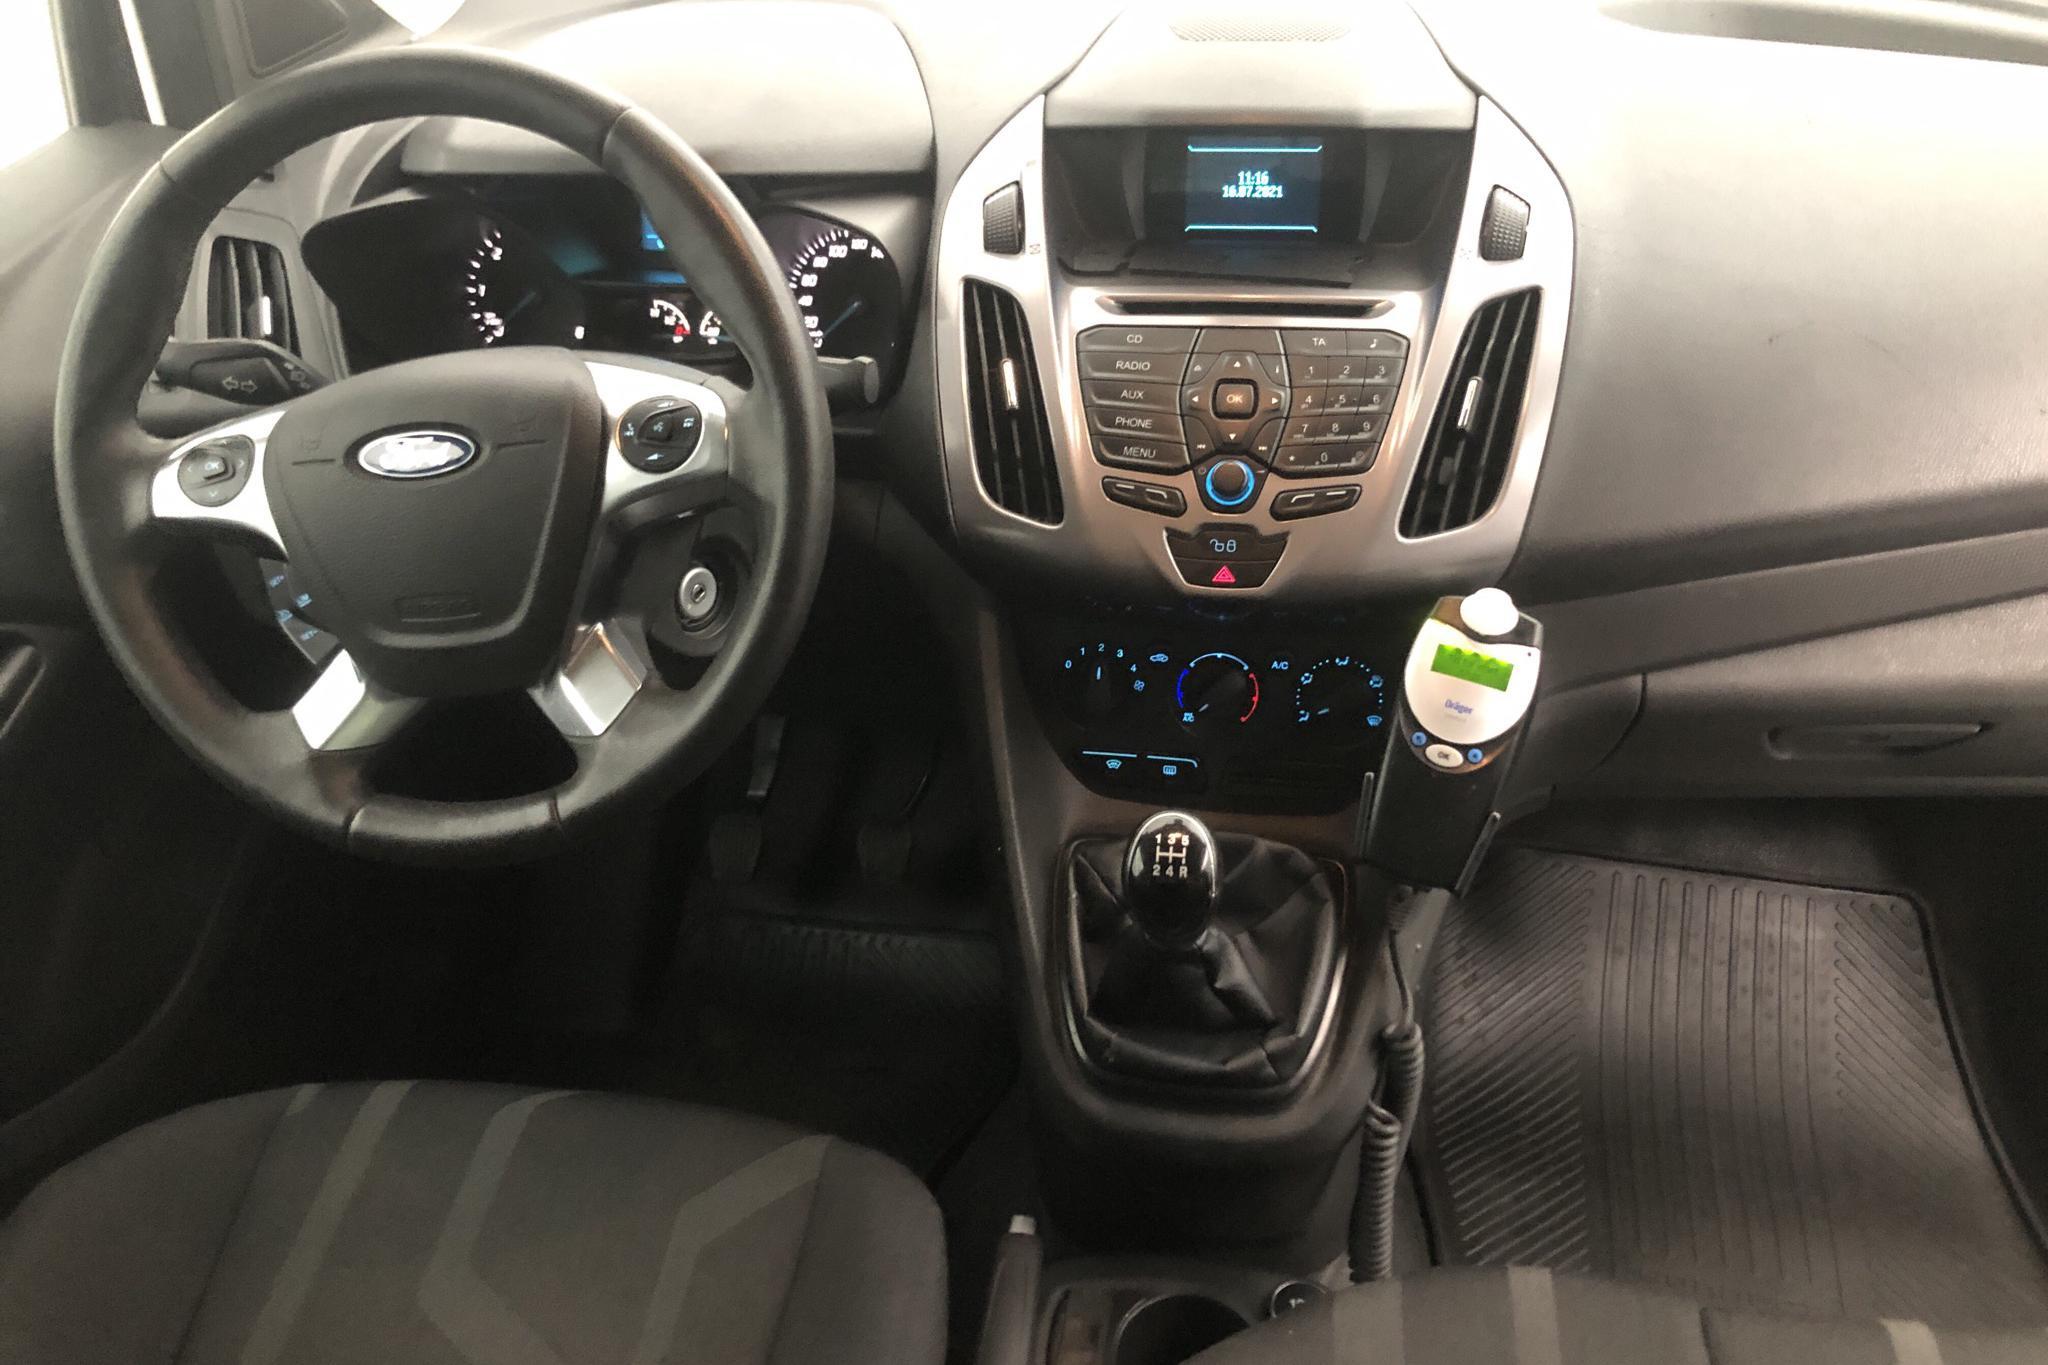 Ford Transit Connect 1.6 TDCi (95hk) - 35 600 km - Manual - white - 2014